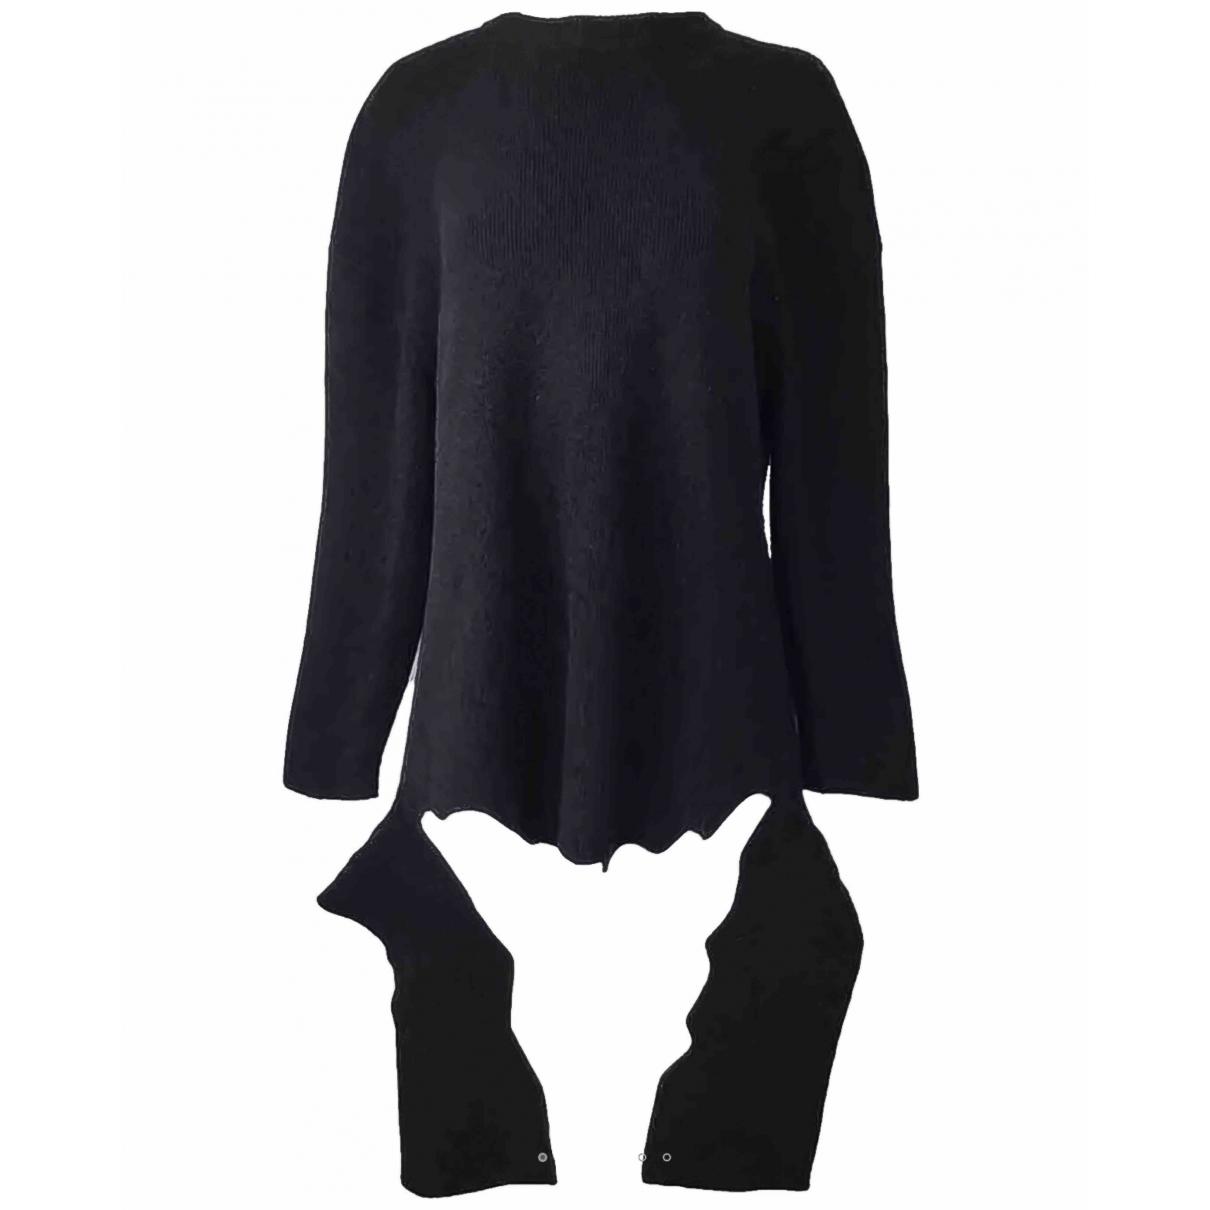 Balenciaga \N Pullover in  Schwarz Kaschmir